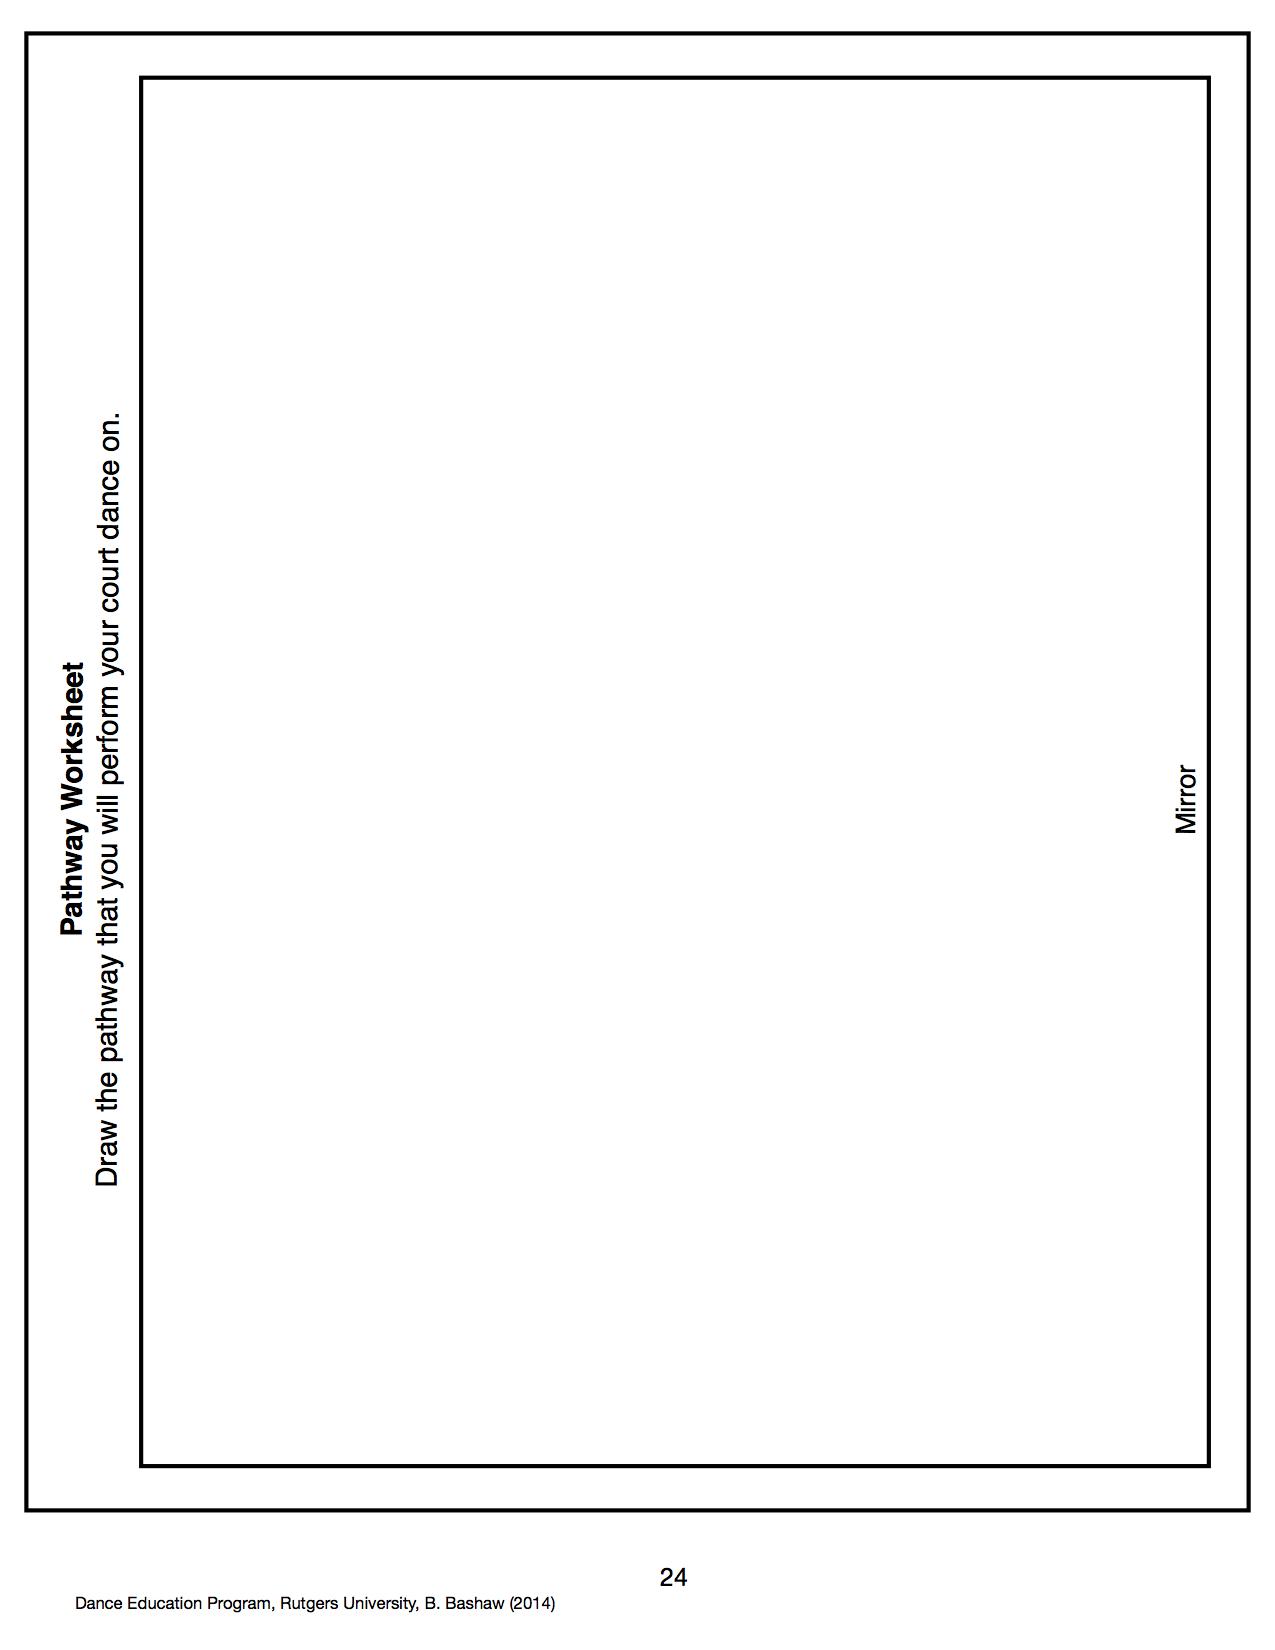 Sample Worksheets And Artifacts Hannah Sego